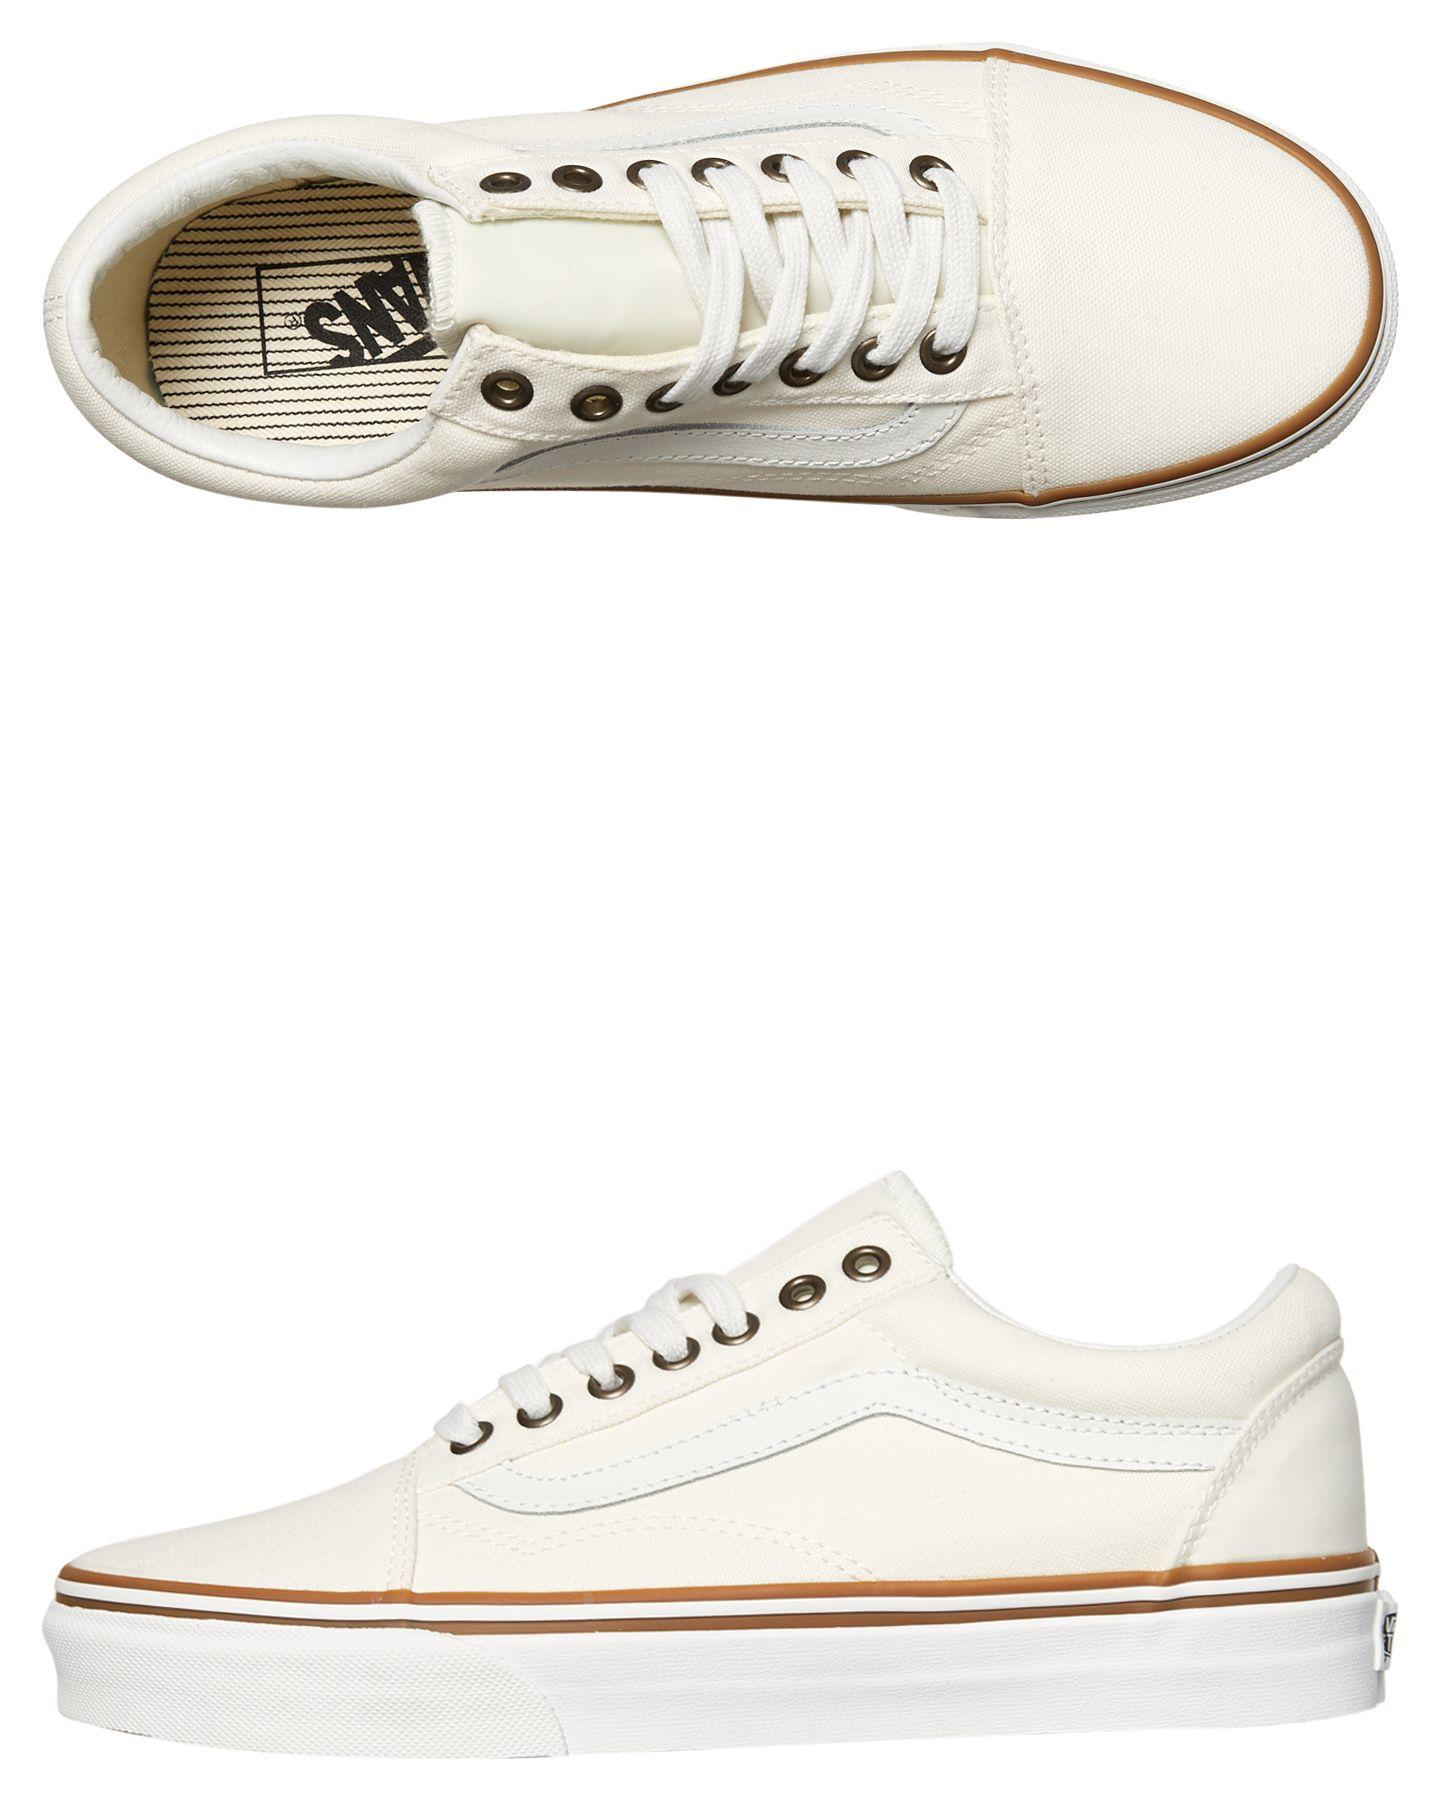 Vans Womens Sun Faded Old Skool Shoe White | SurfStitch